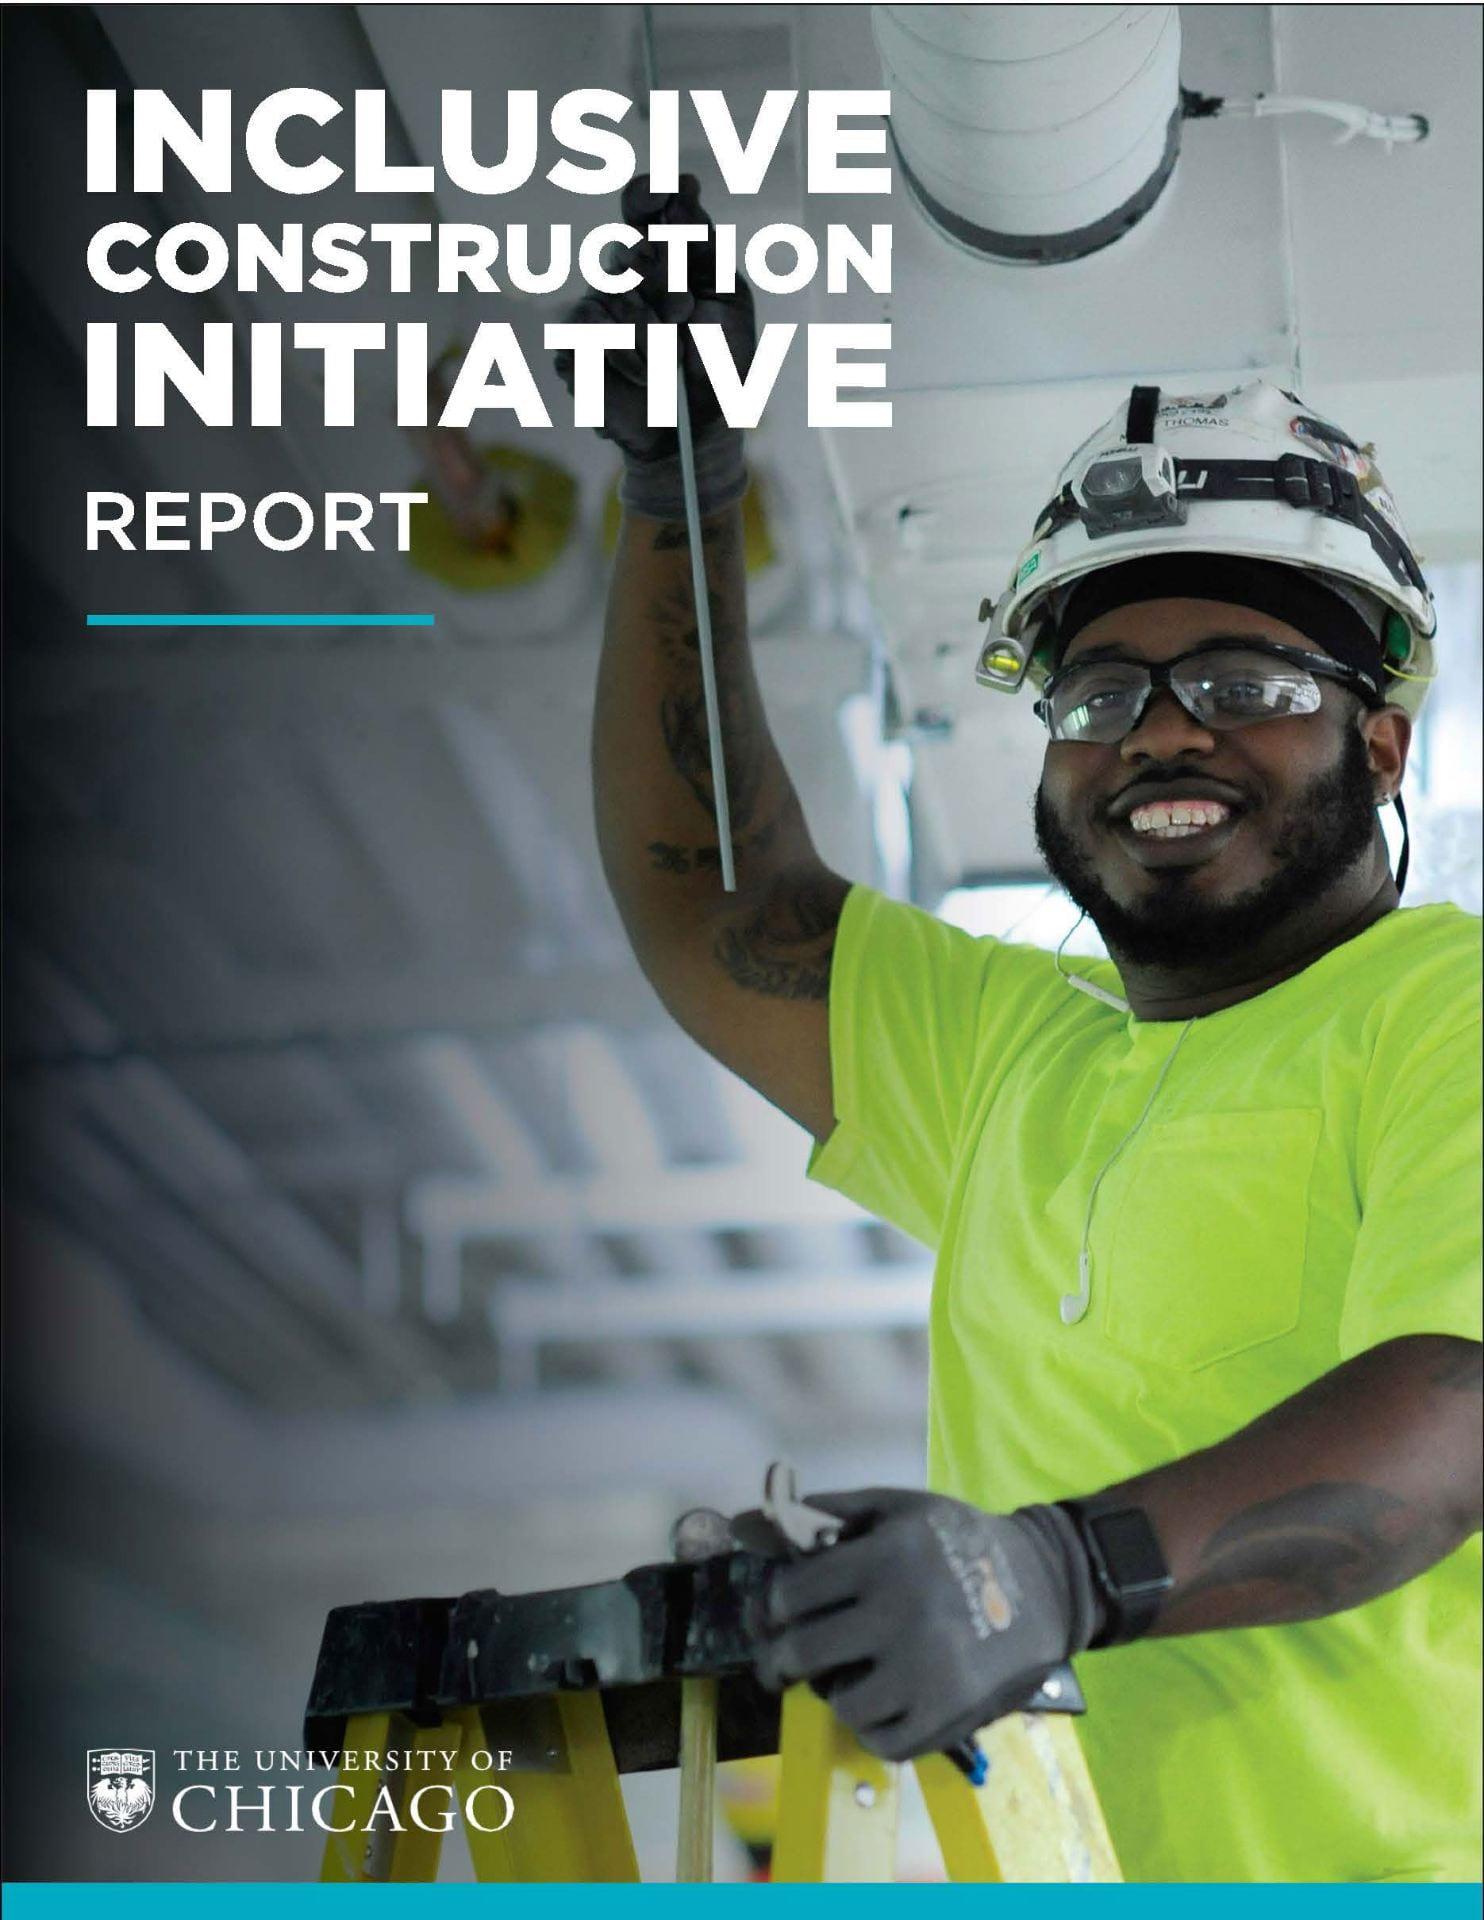 Inclusive Construction Initiative Report Cover